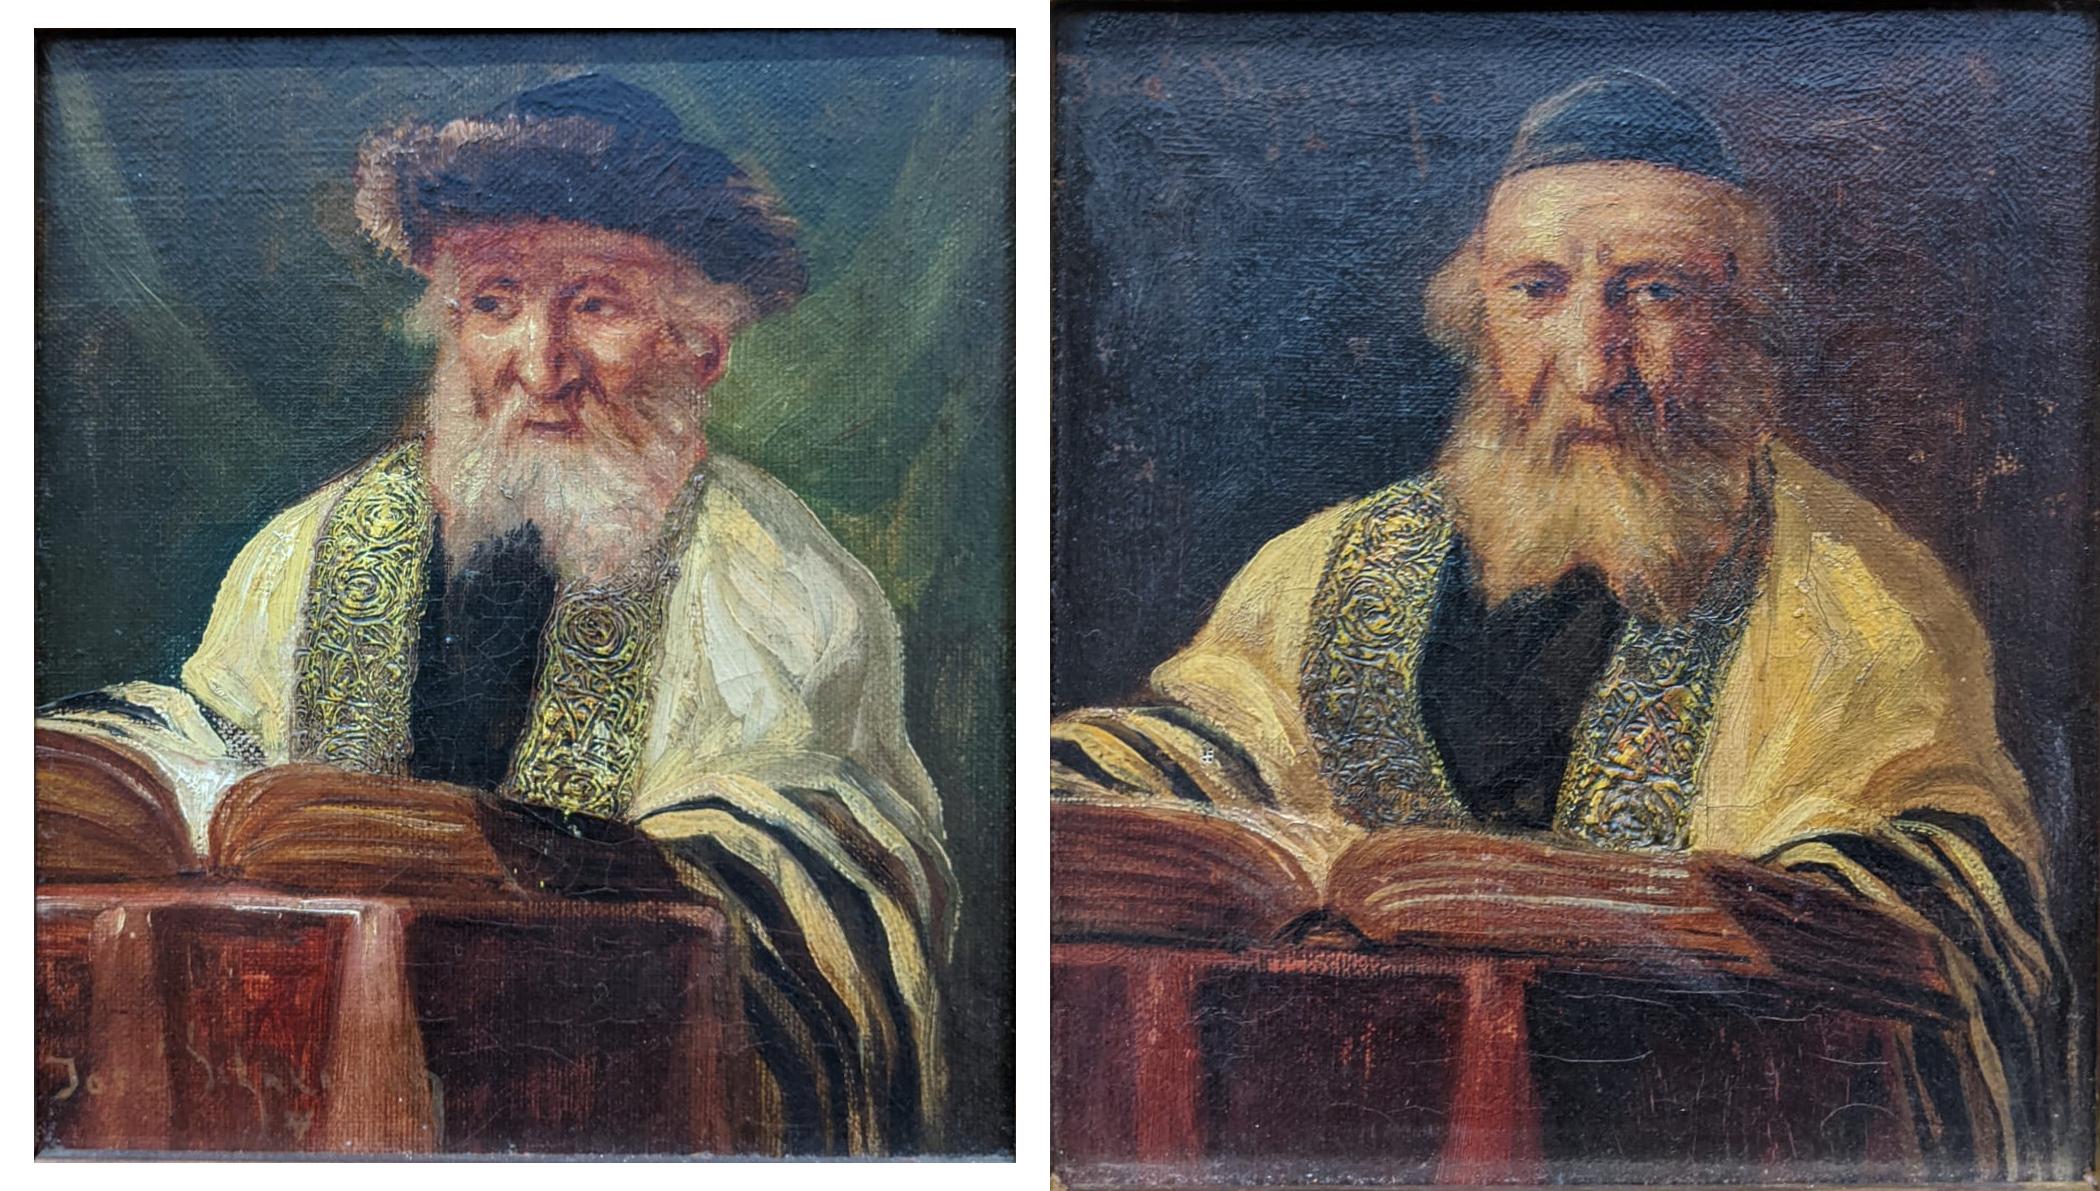 Jose Schneider (American/Spanish, 1848-1893), Rabbi Studying and Rabbi, oils on canvas, both